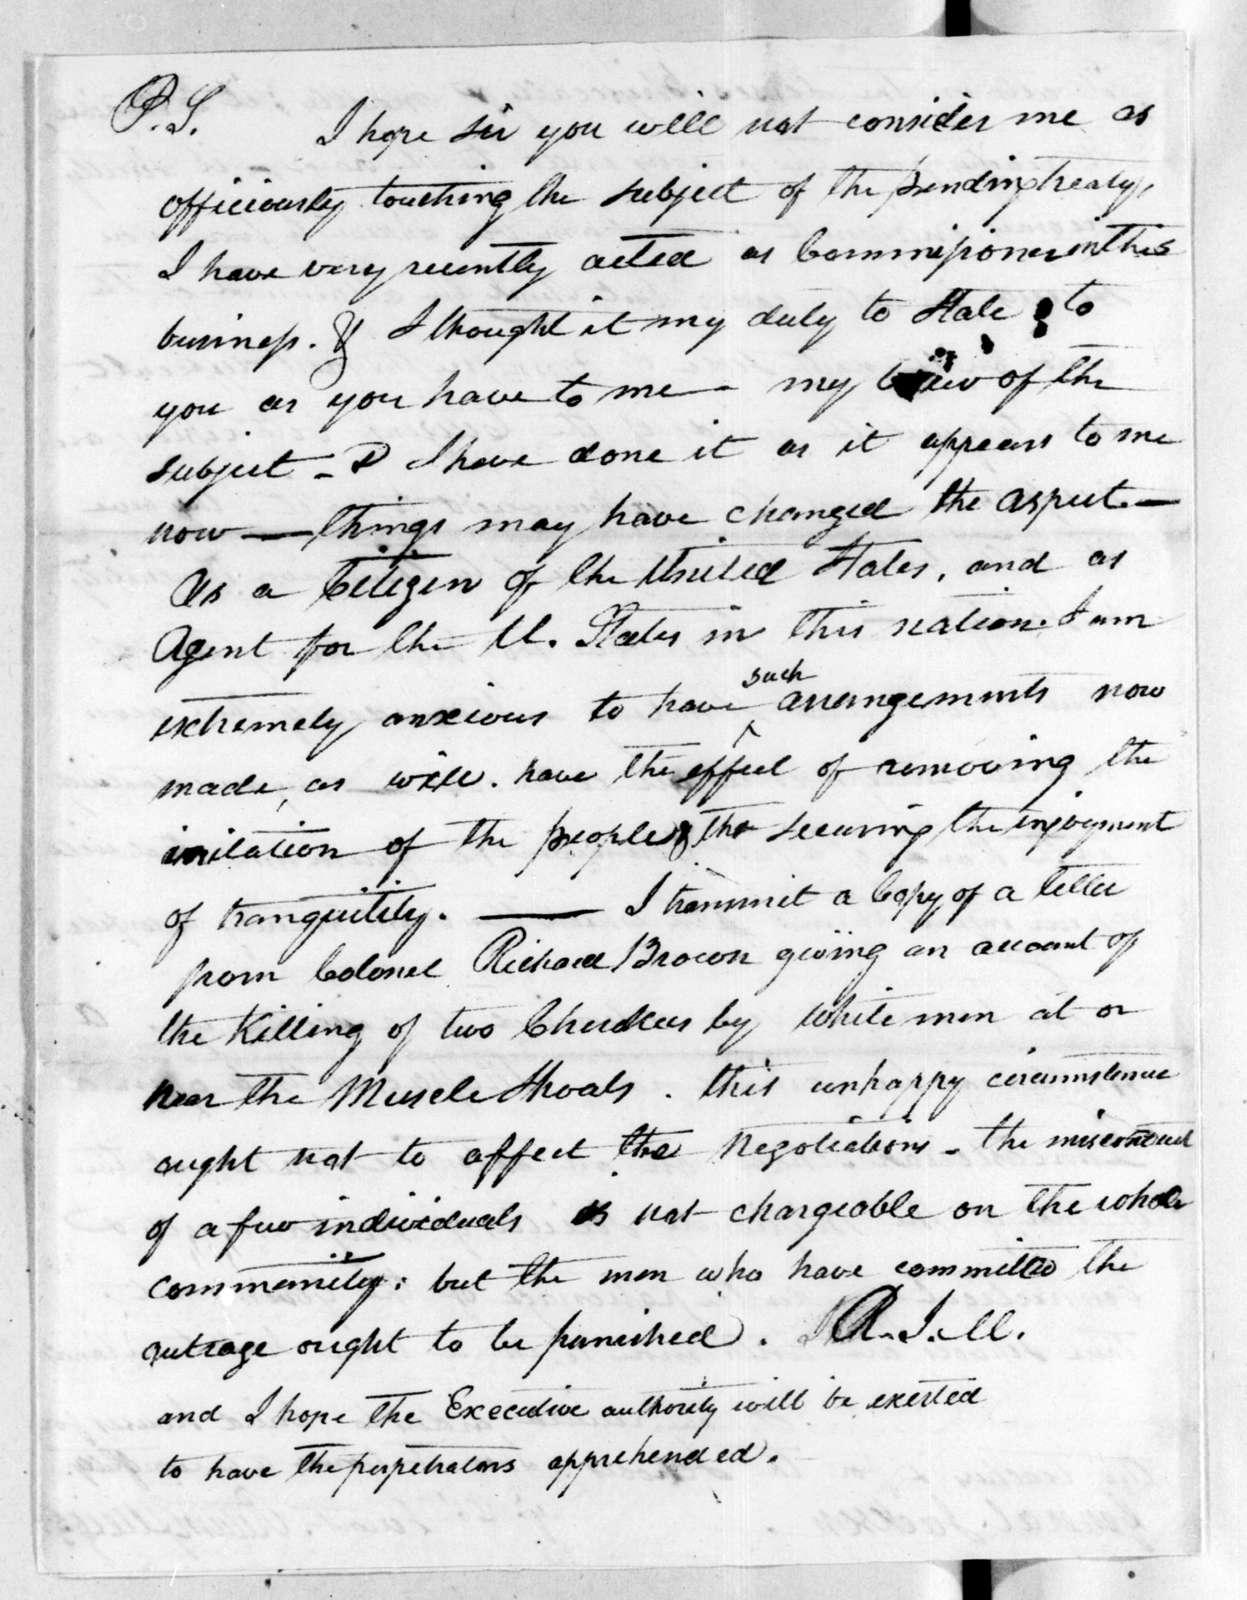 Return Jonathan Meigs to Andrew Jackson, August 19, 1816